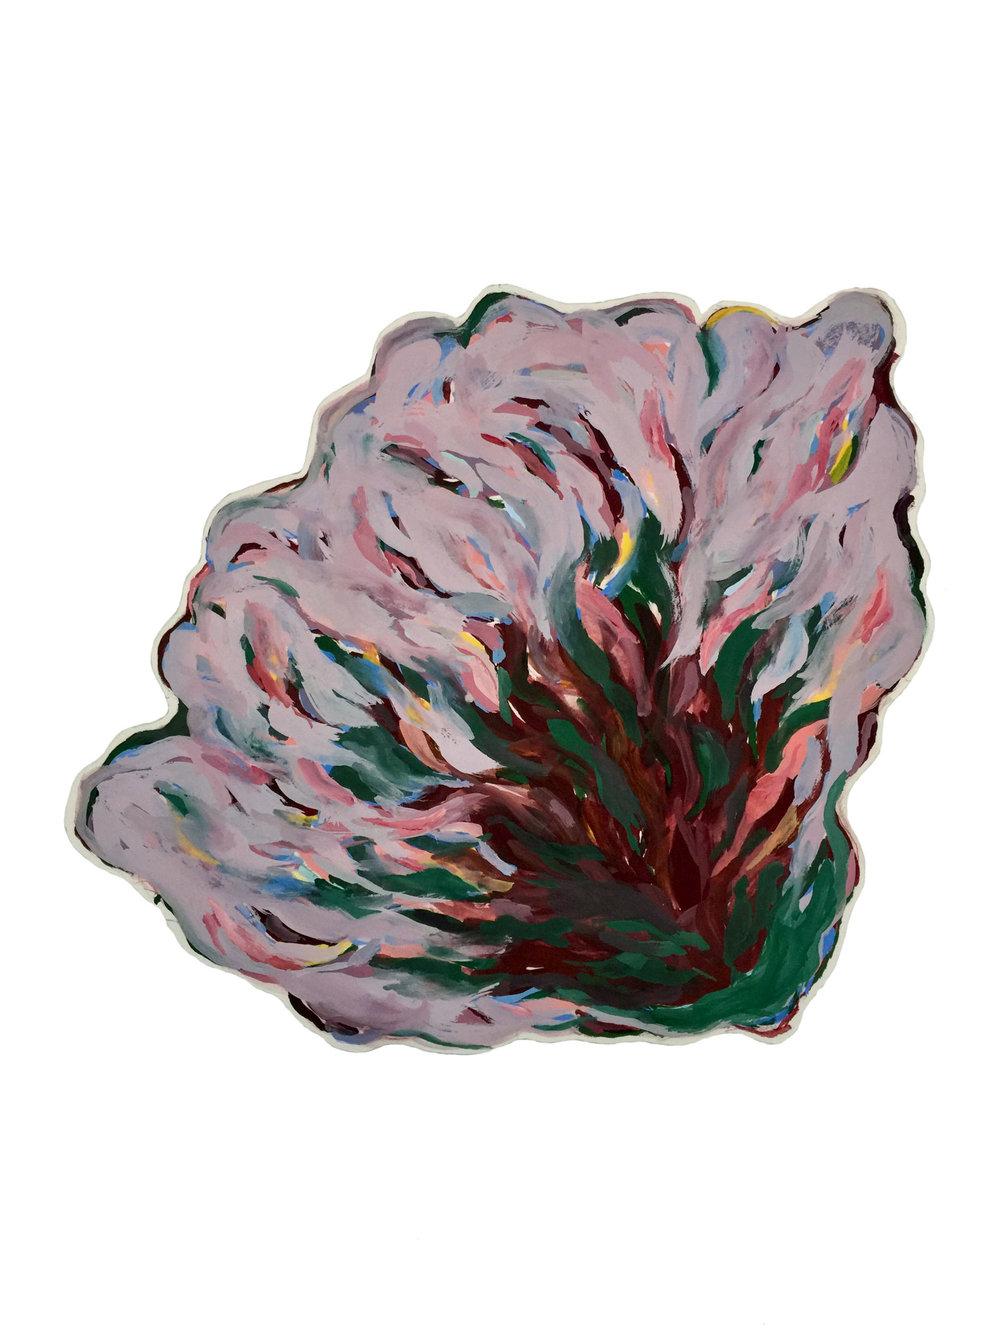 Untiled (Chrysanthemum)